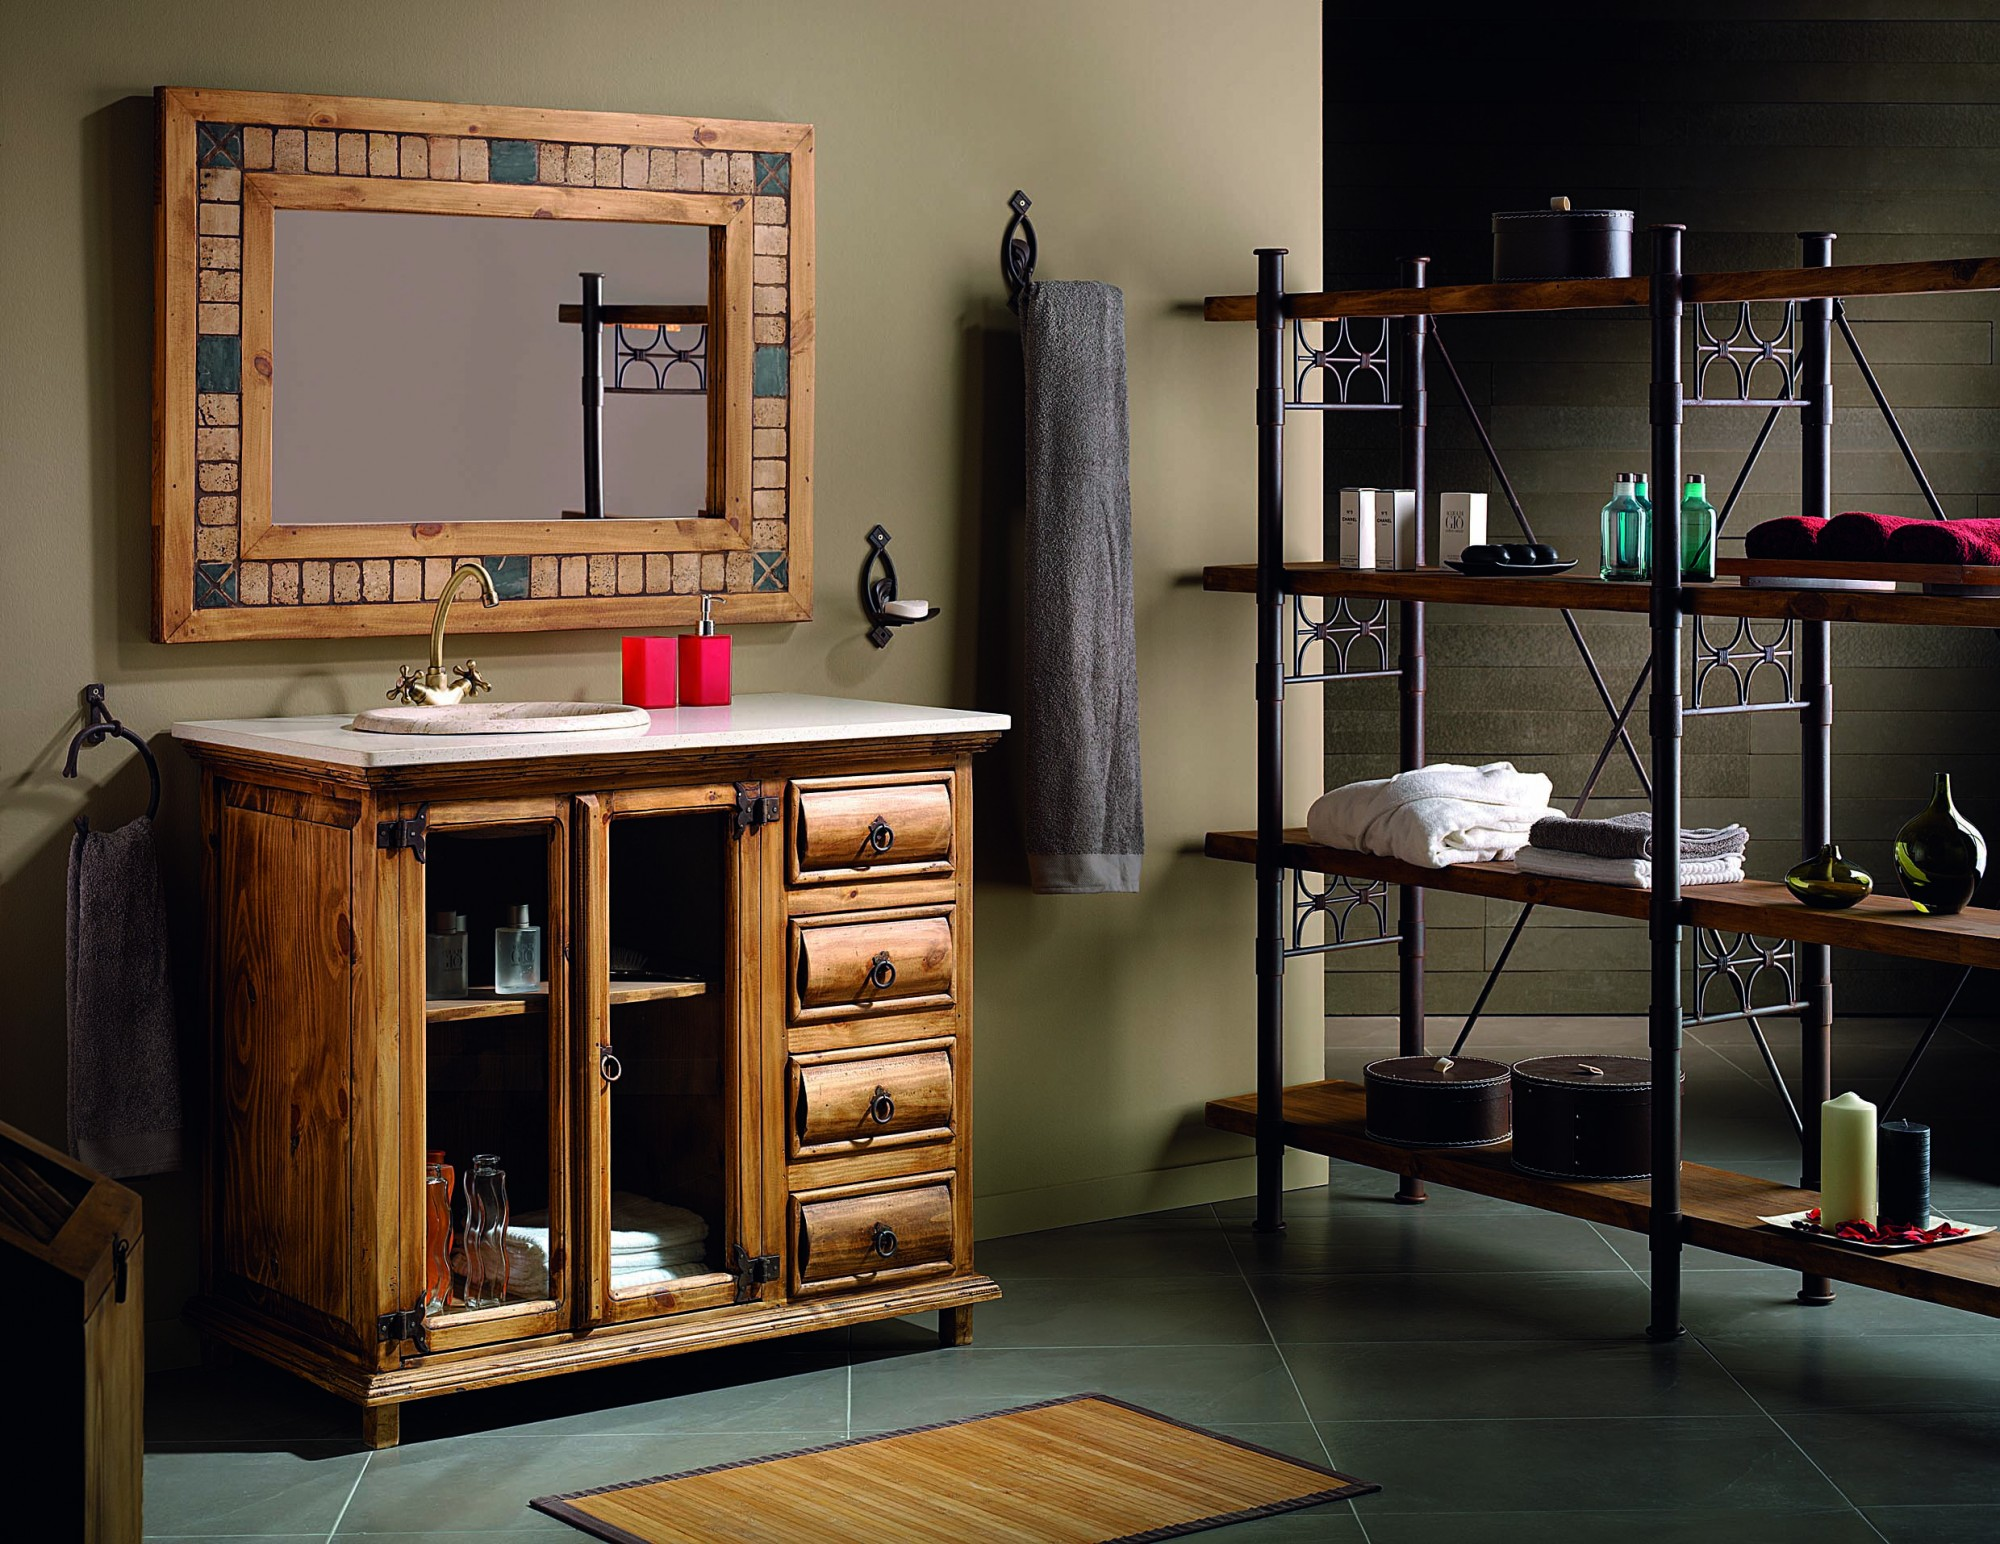 Muebles r sticos de madera maciza baratos online for Muebles de madera baratos online